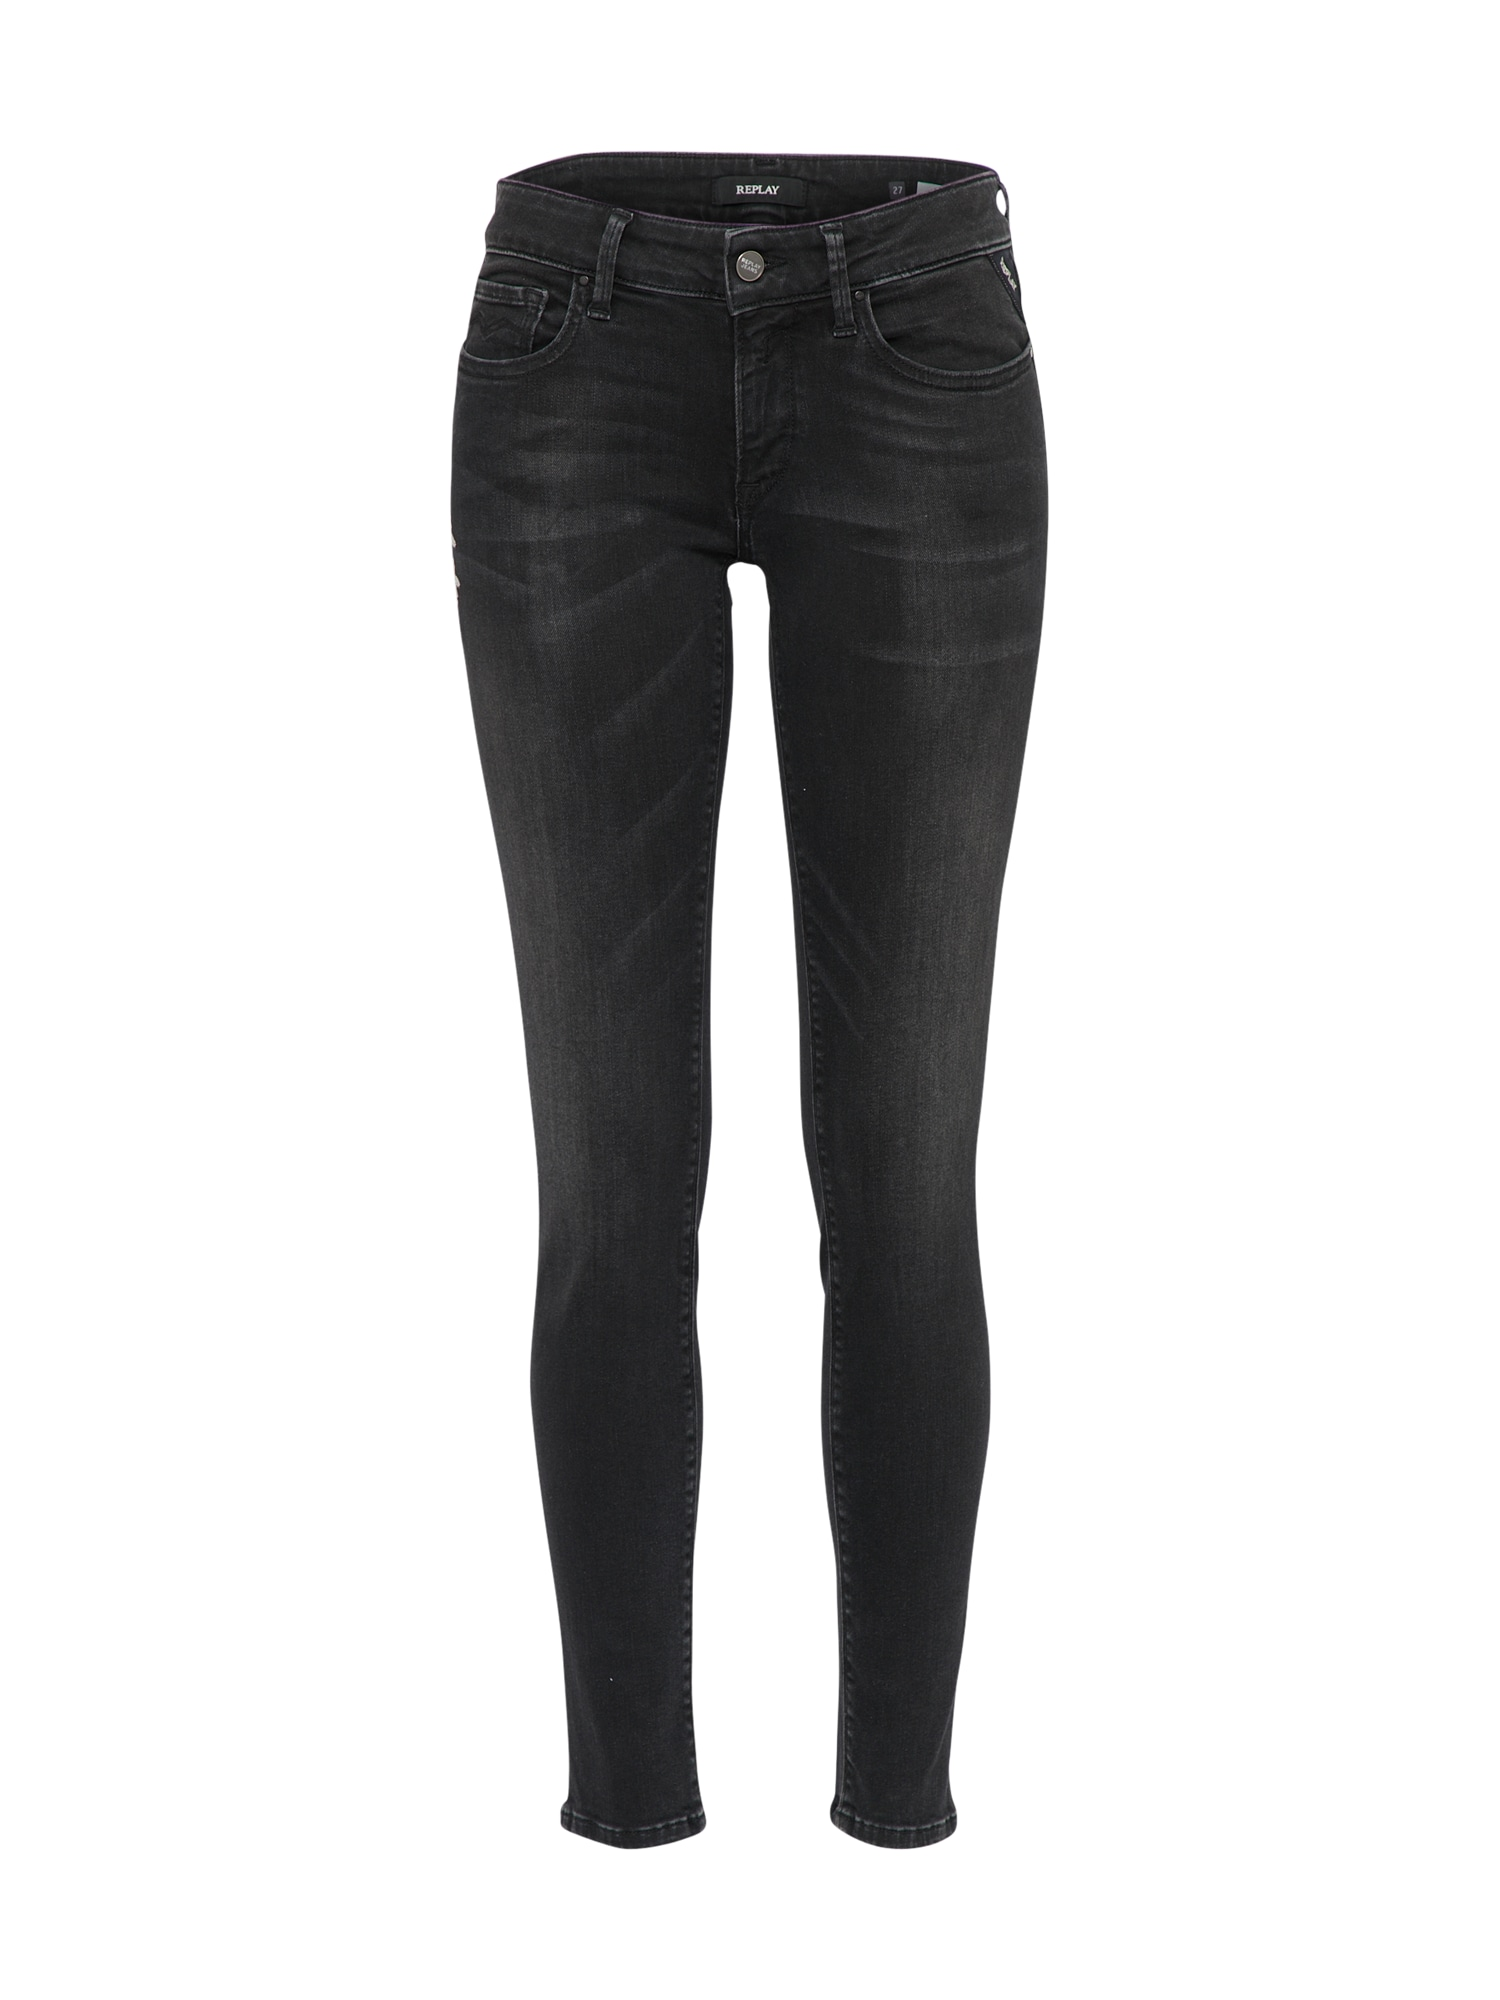 REPLAY Dames Jeans LUZ black denim